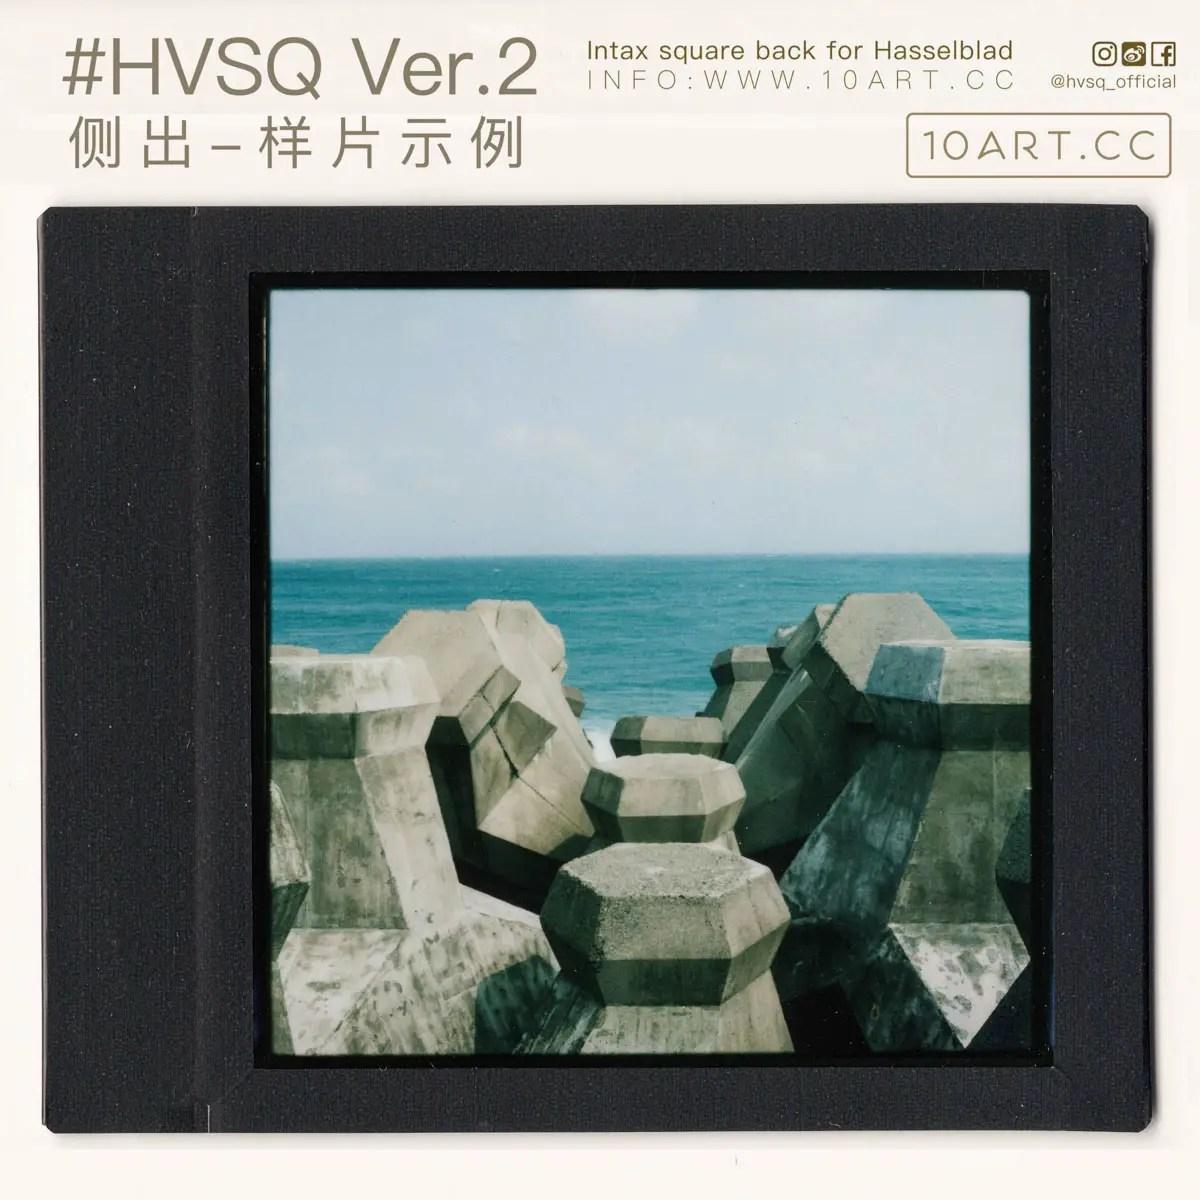 HVSQ Ver.2 + Instax Square